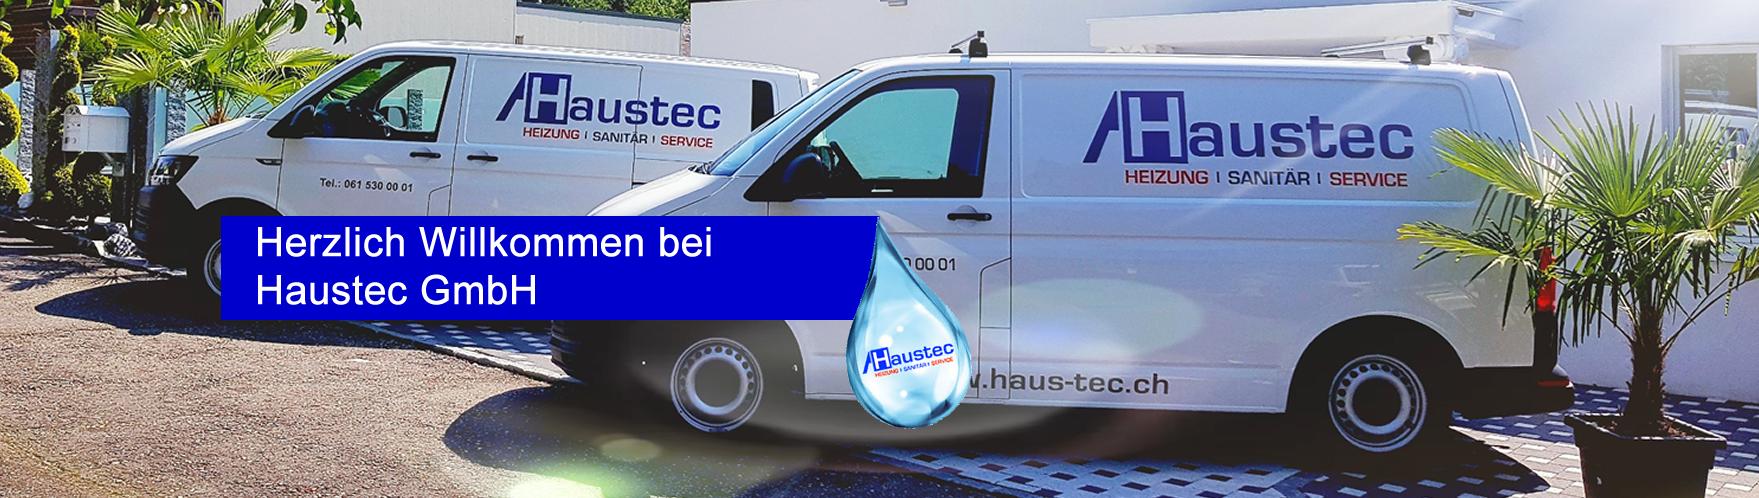 Haustec GmbH